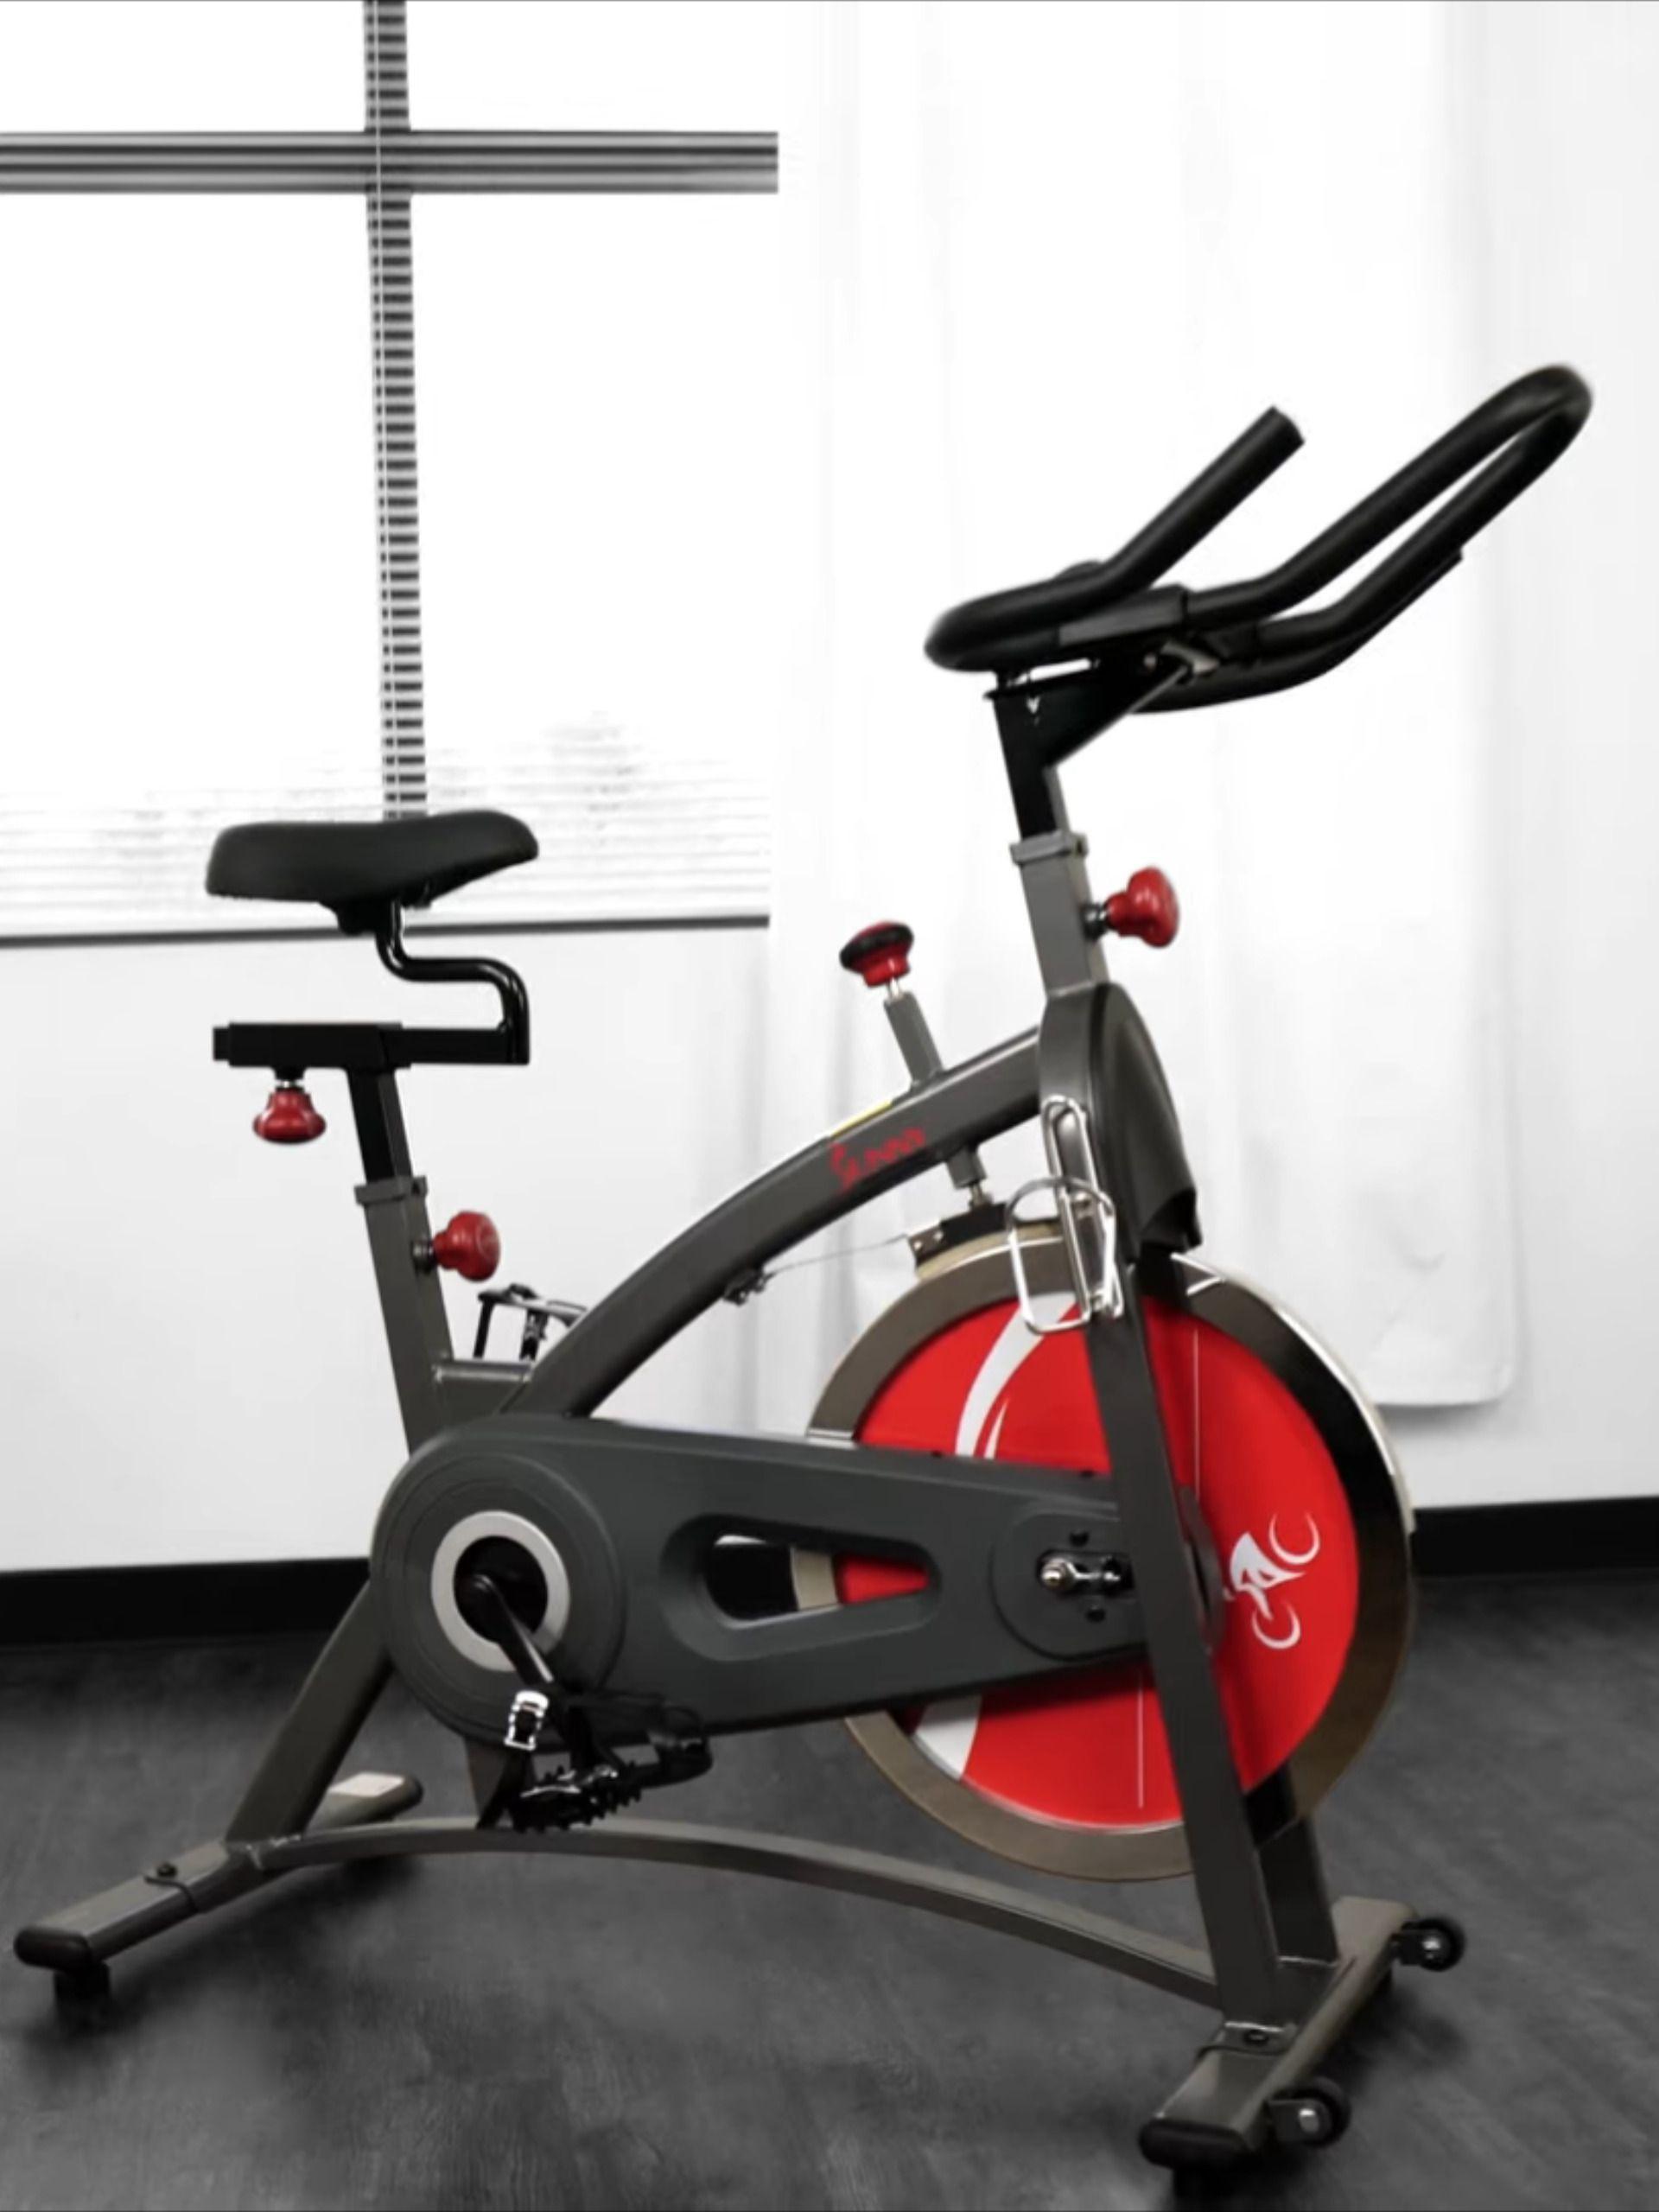 Sunny Health Fitness Sf B1423 Biking Workout Spin Bikes Spin Bike Workouts